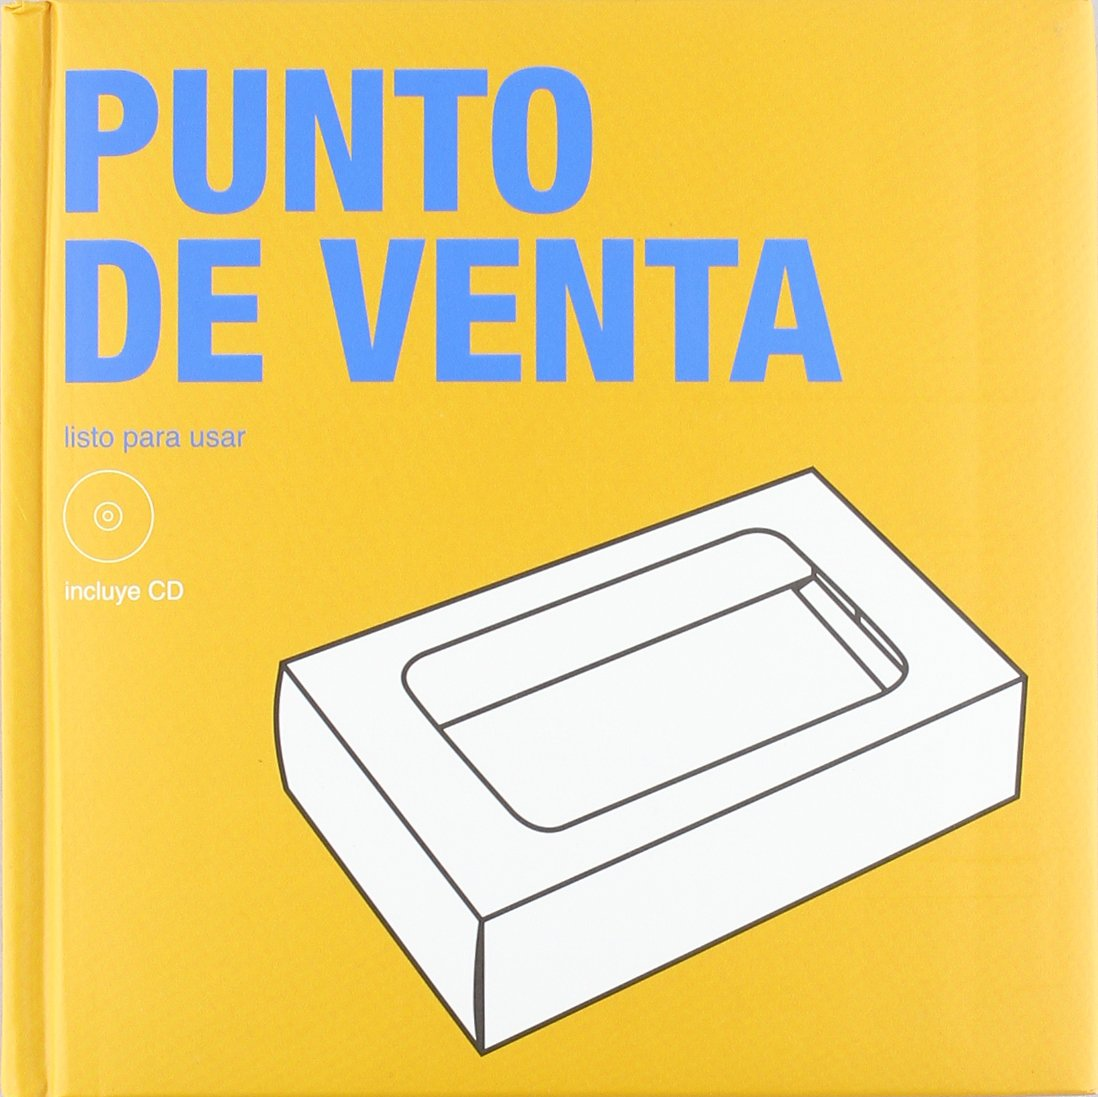 PUNTO DE VENTA LISTO PARA USAR INCLUYE CD (Spanish) Paperback – 2008